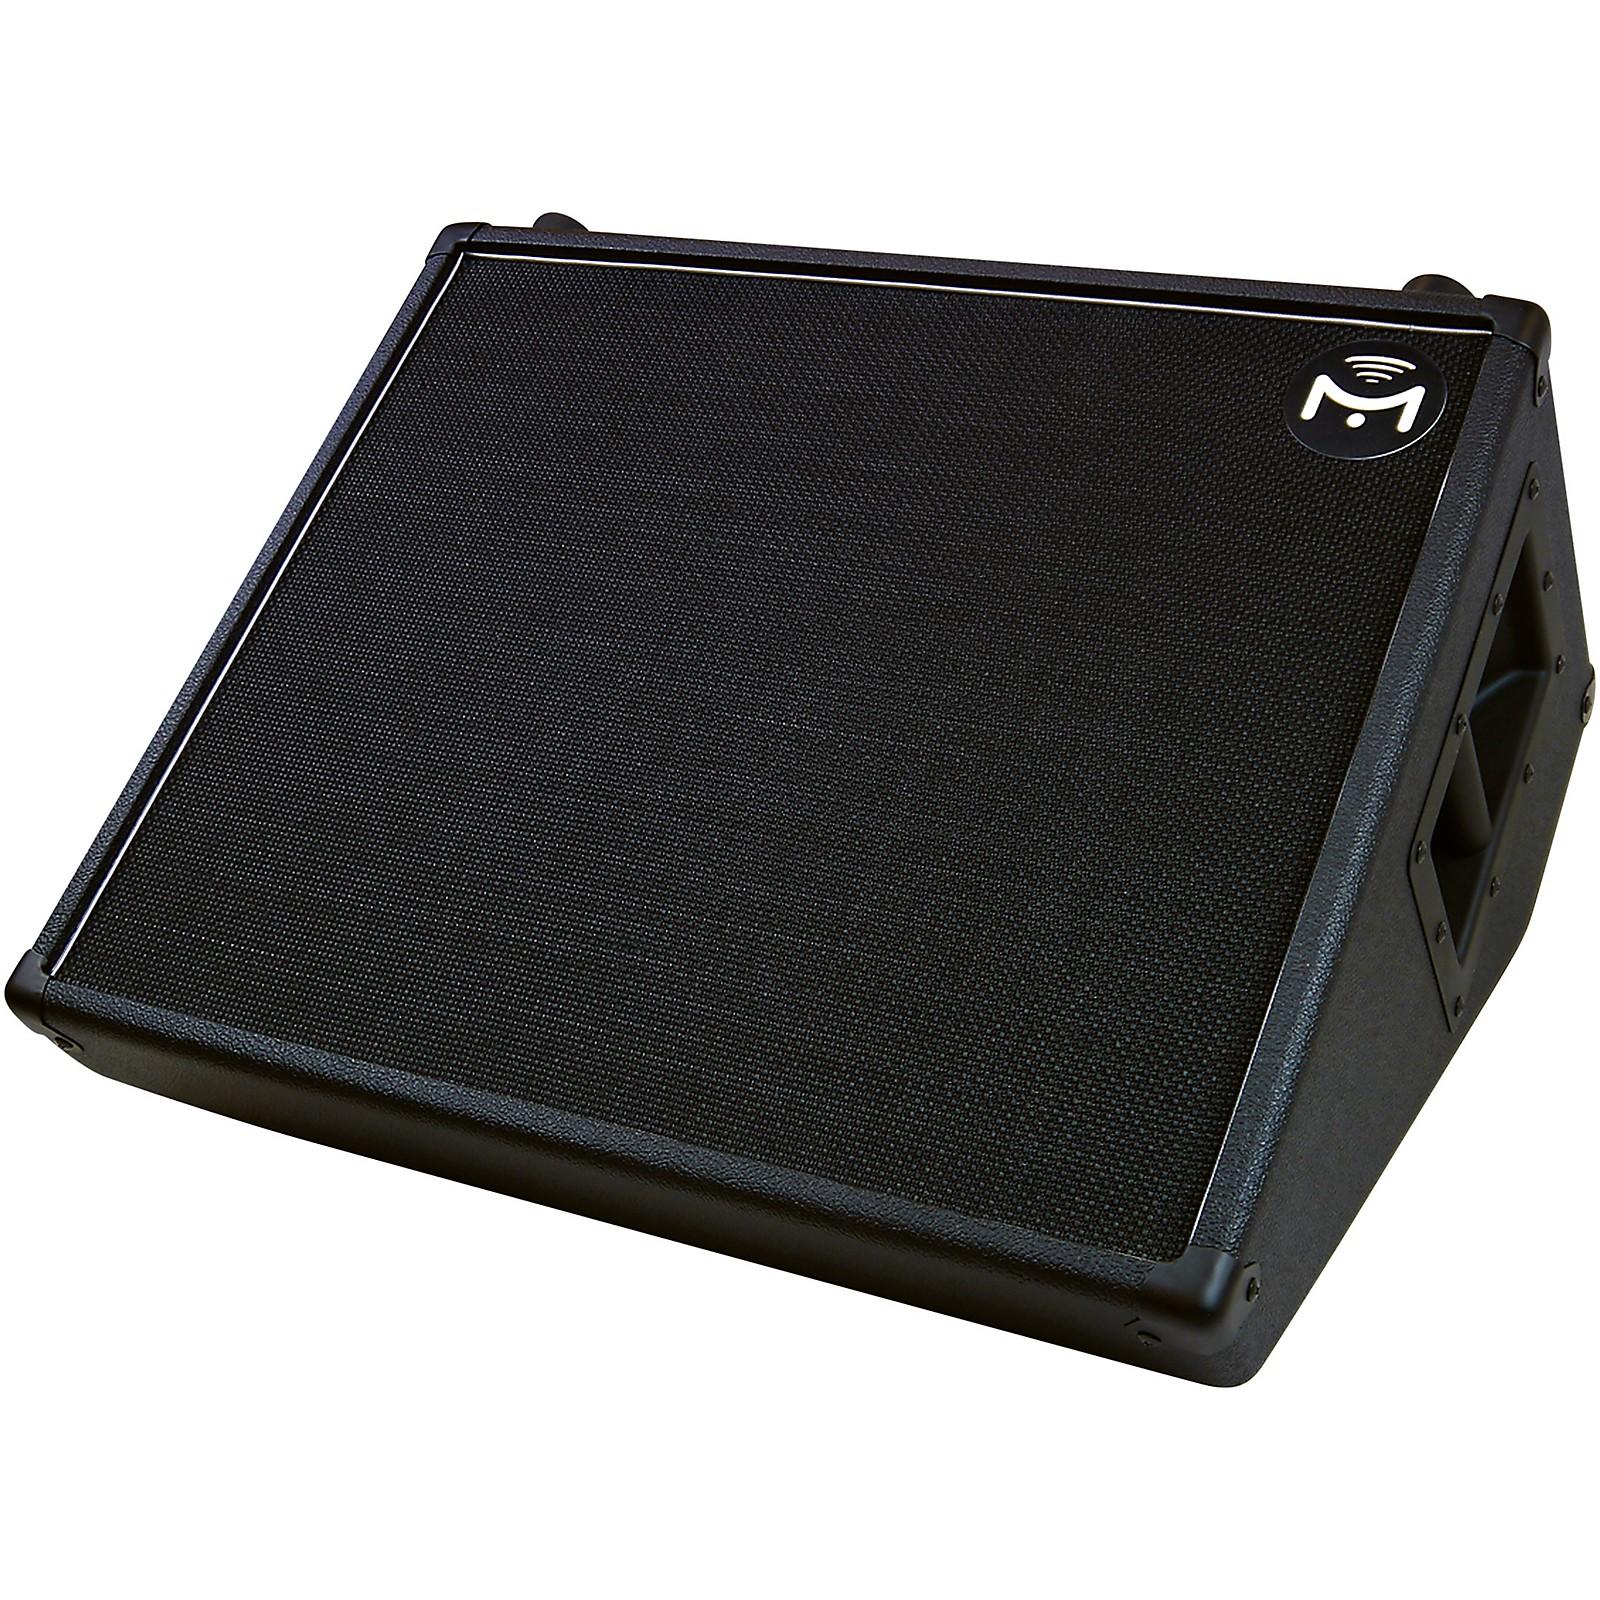 Open Box Mission Engineering Full Range Flat Response Powered Wedge Monitor